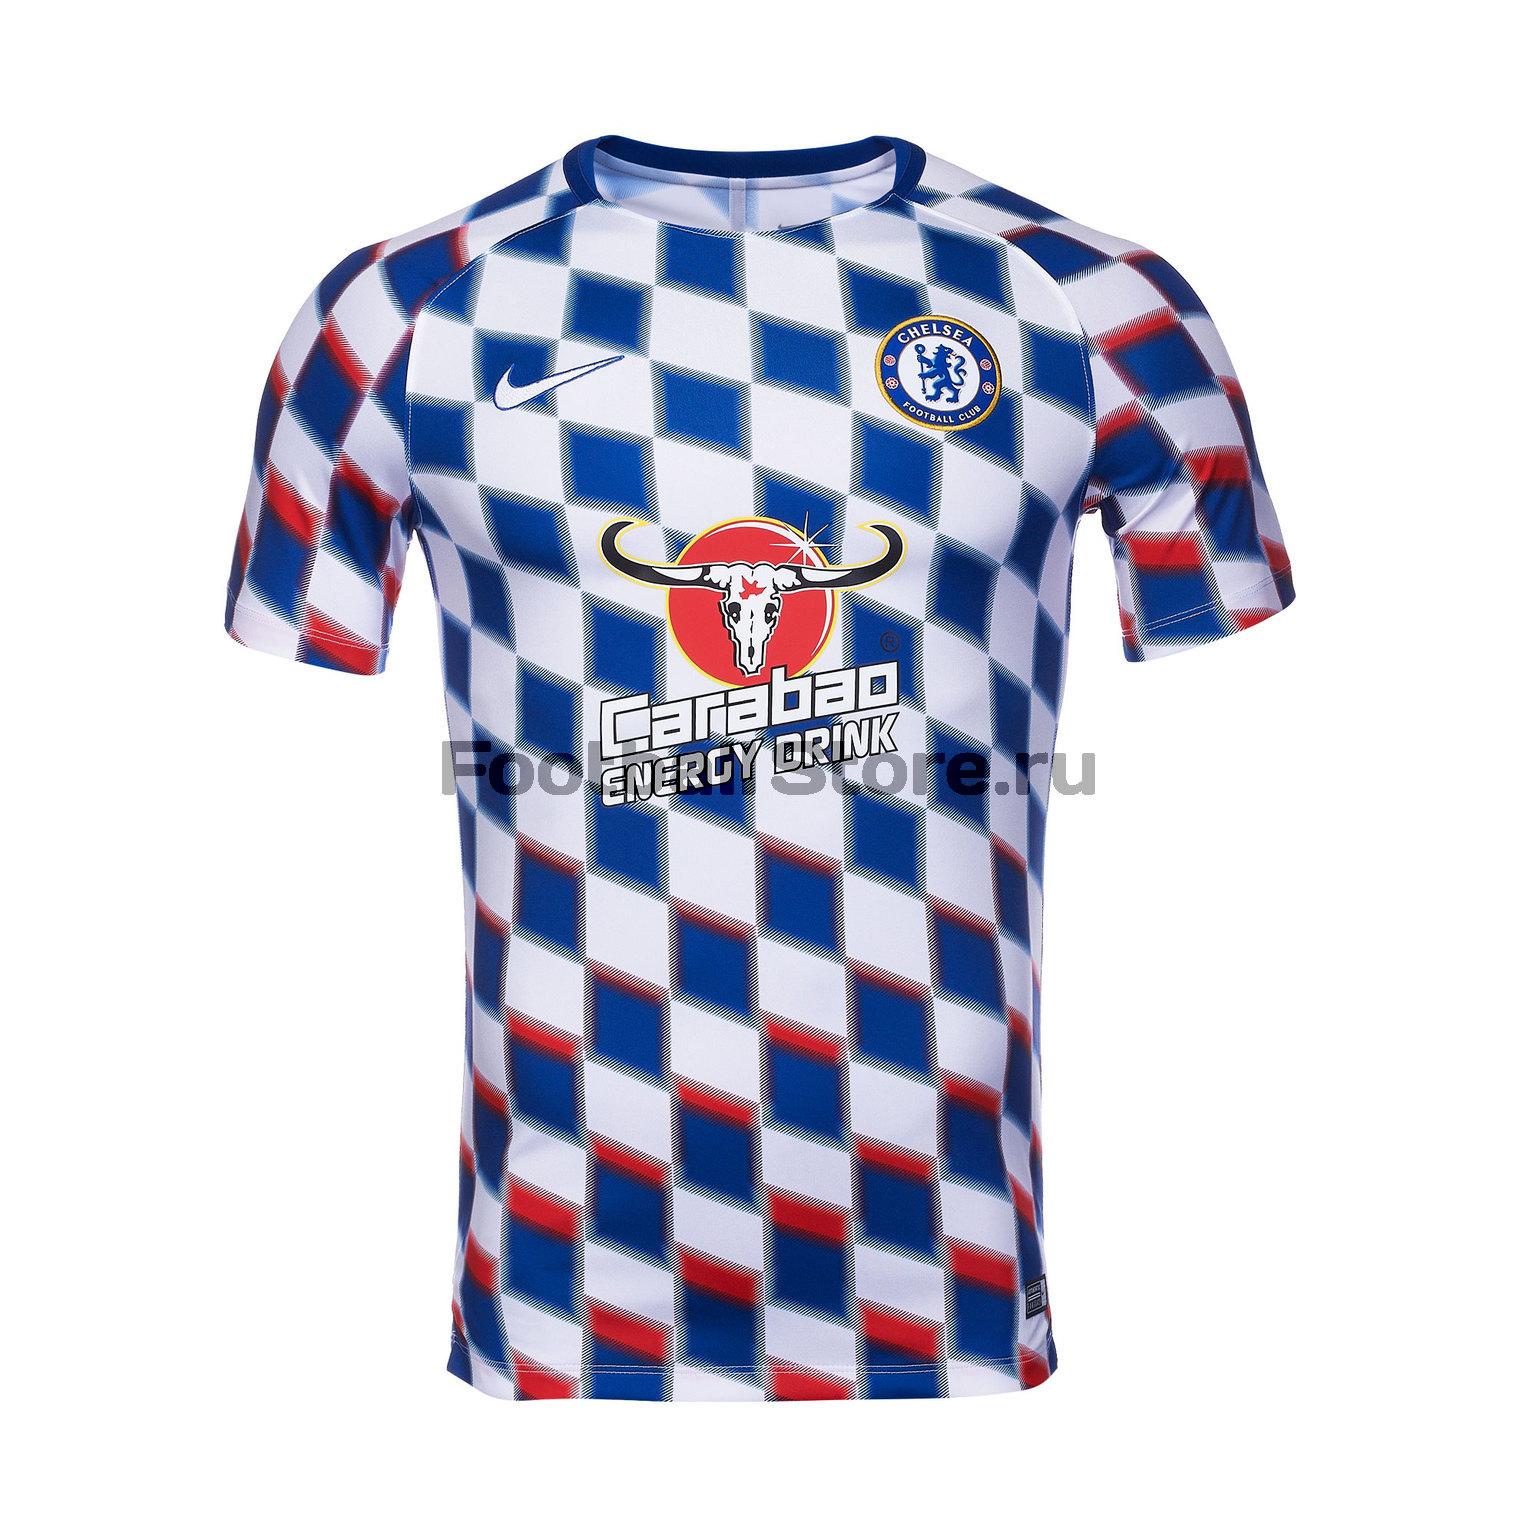 Футболка тренировочная Nike Chelsea Dry Sqd Top SS GX2 919937-101 футболки nike футболка тренировочная nike cr7 dry sqd top 845557 457